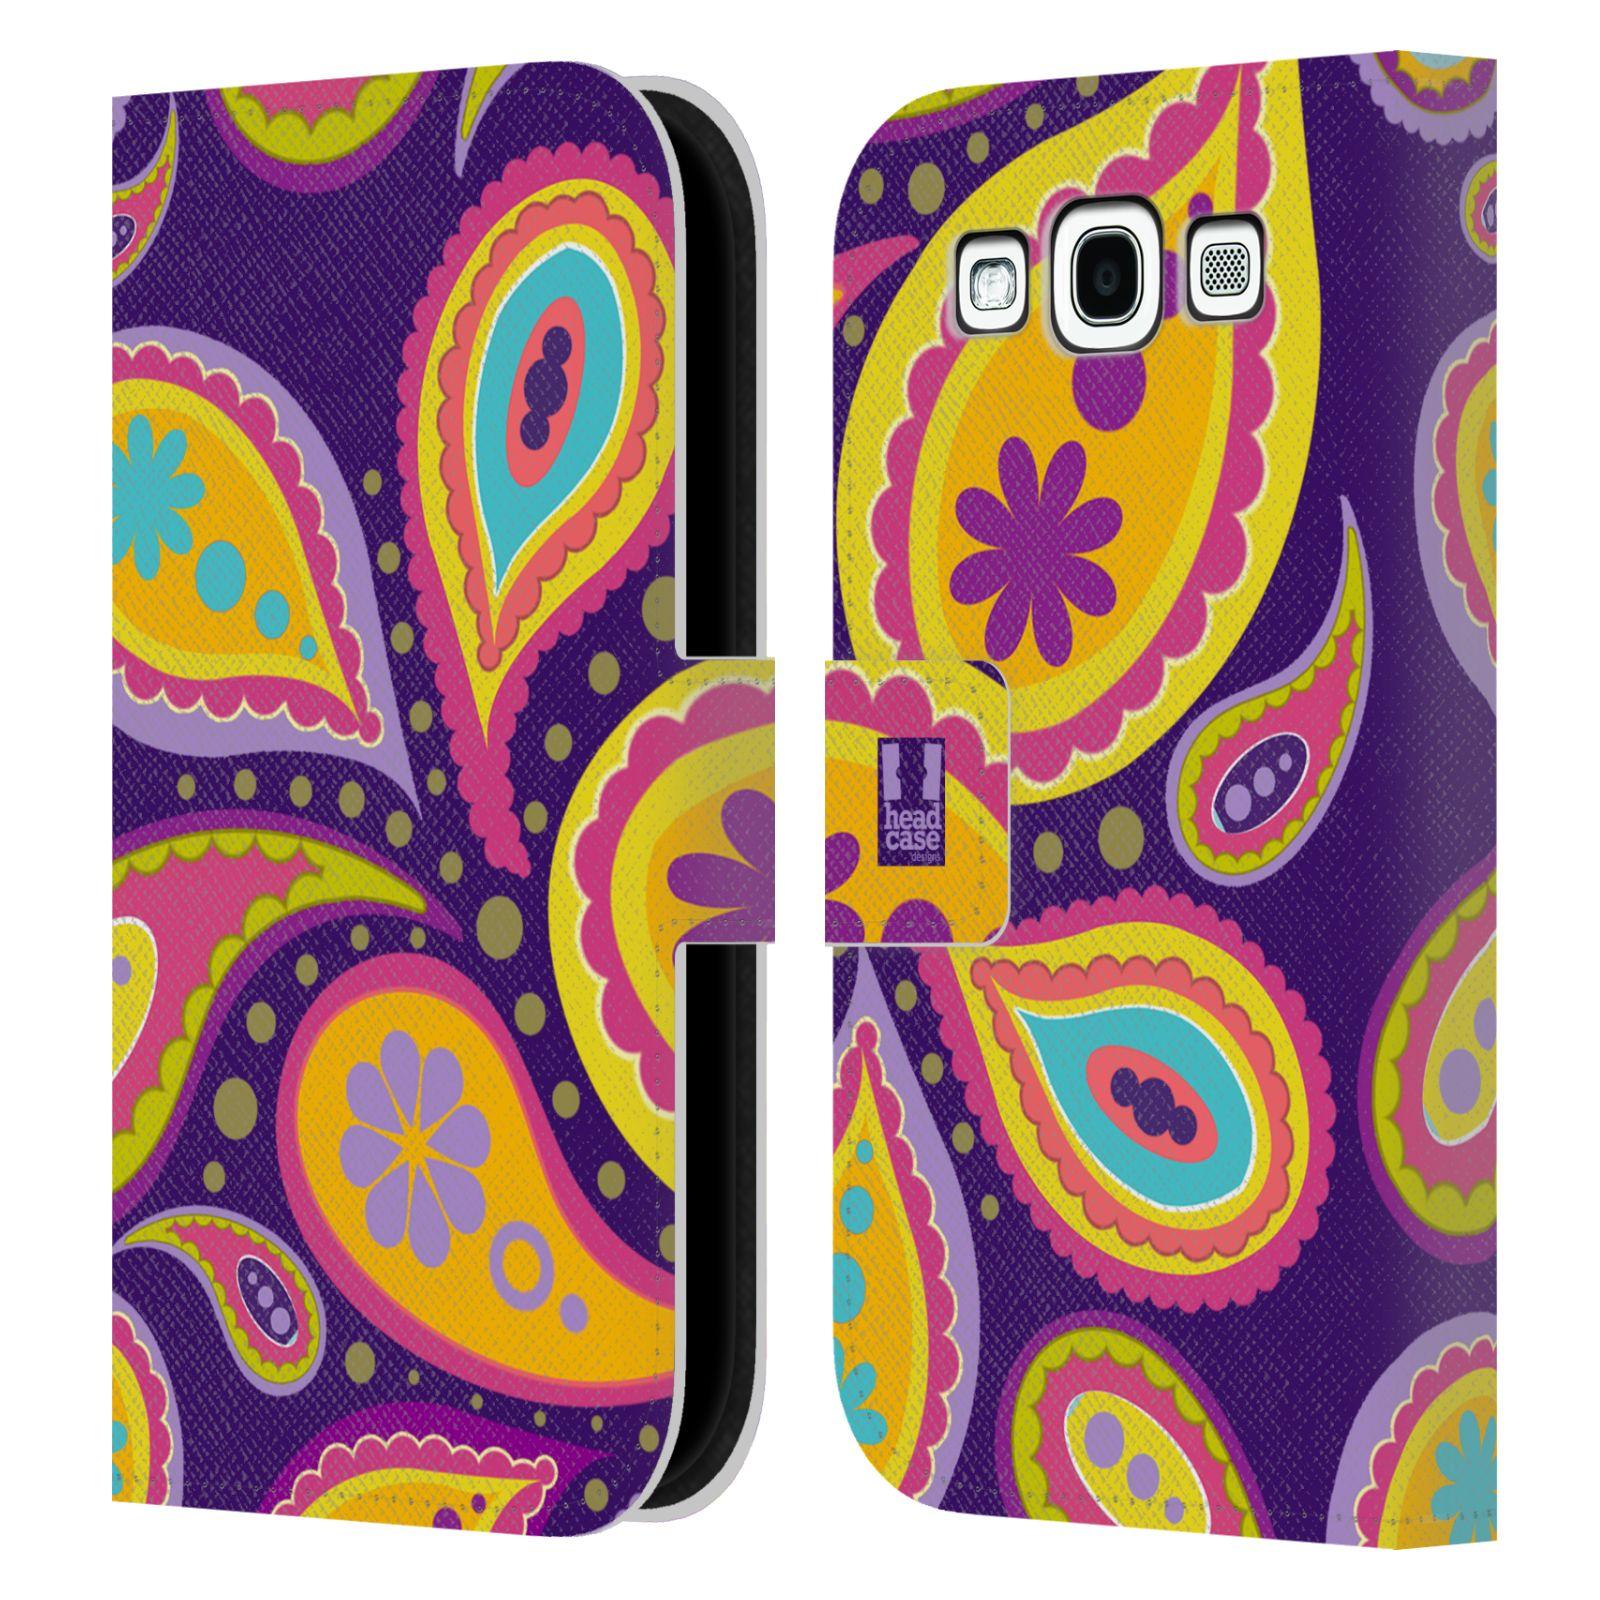 HEAD CASE Flipové pouzdro pro mobil Samsung Galaxy S3 barevné slzy fialová a oranžová